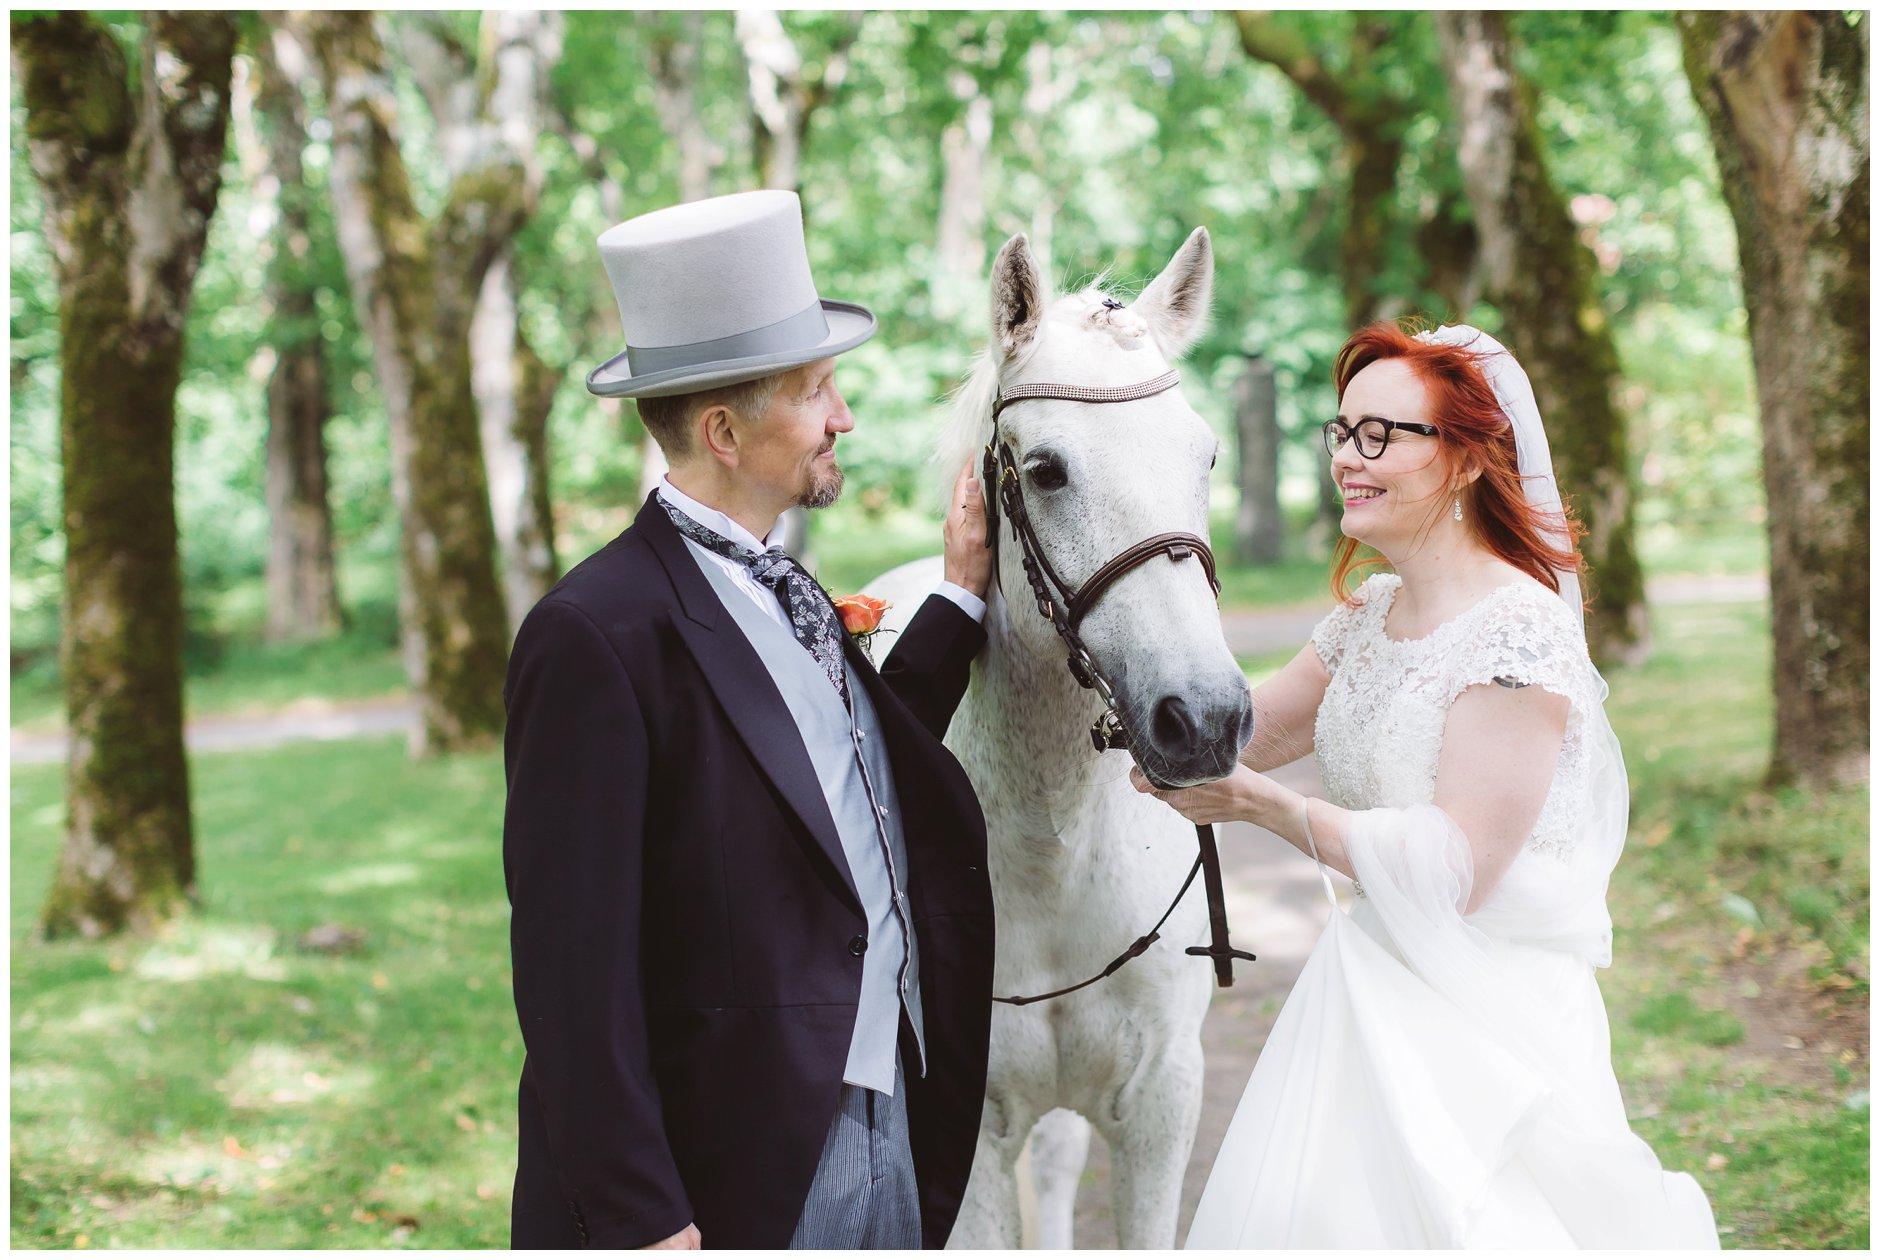 Bryllupsfotografering med hvit hest